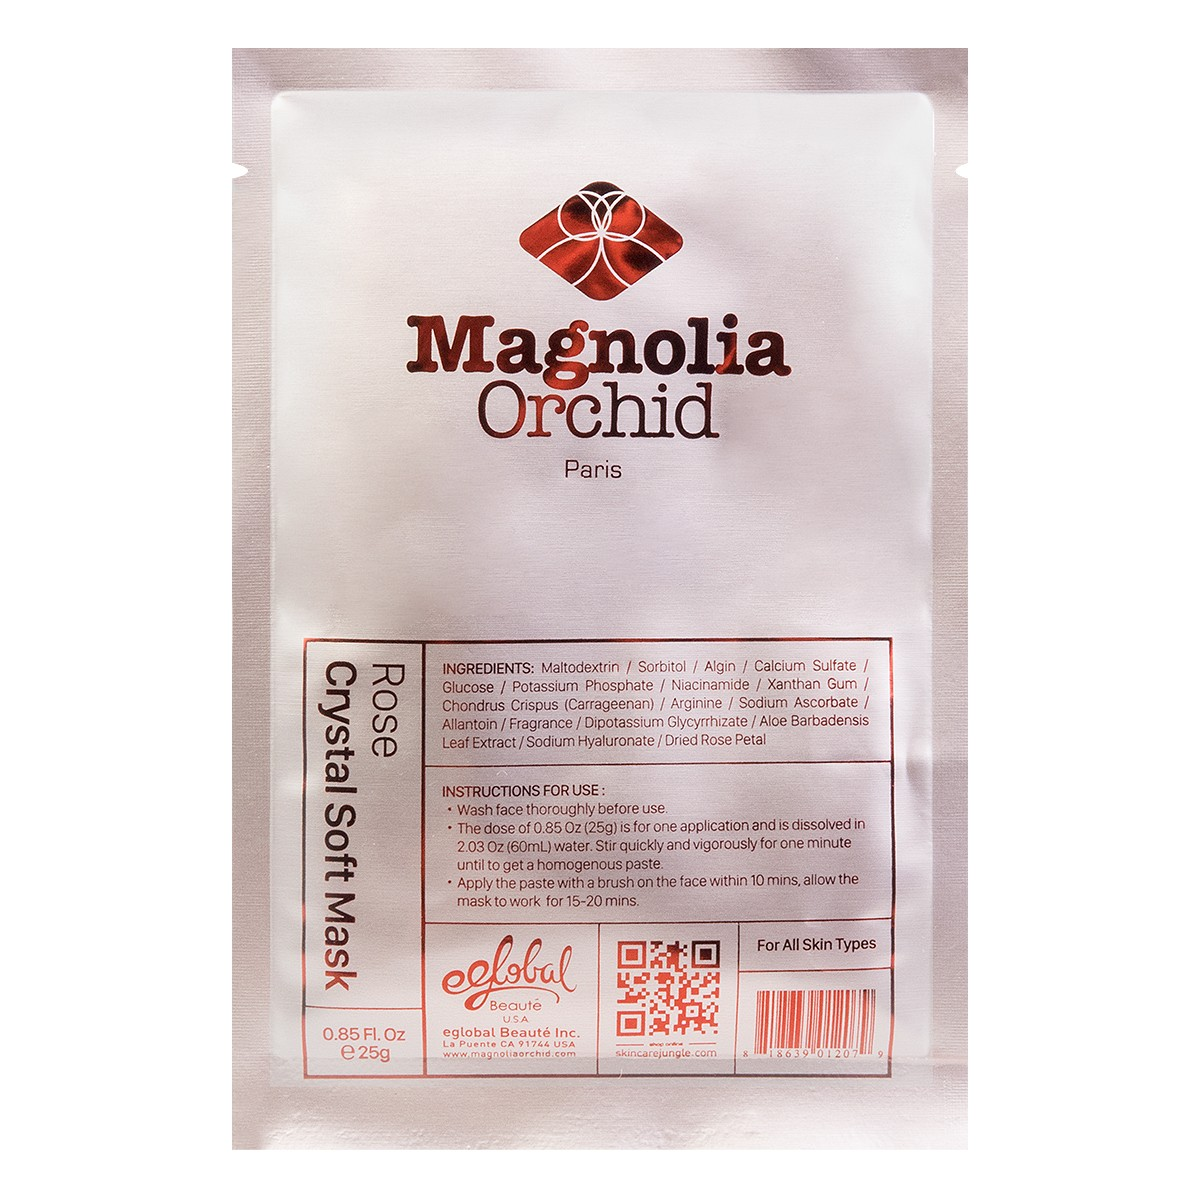 MAGNOLIA ORCHID rose crystal soft mask 25g